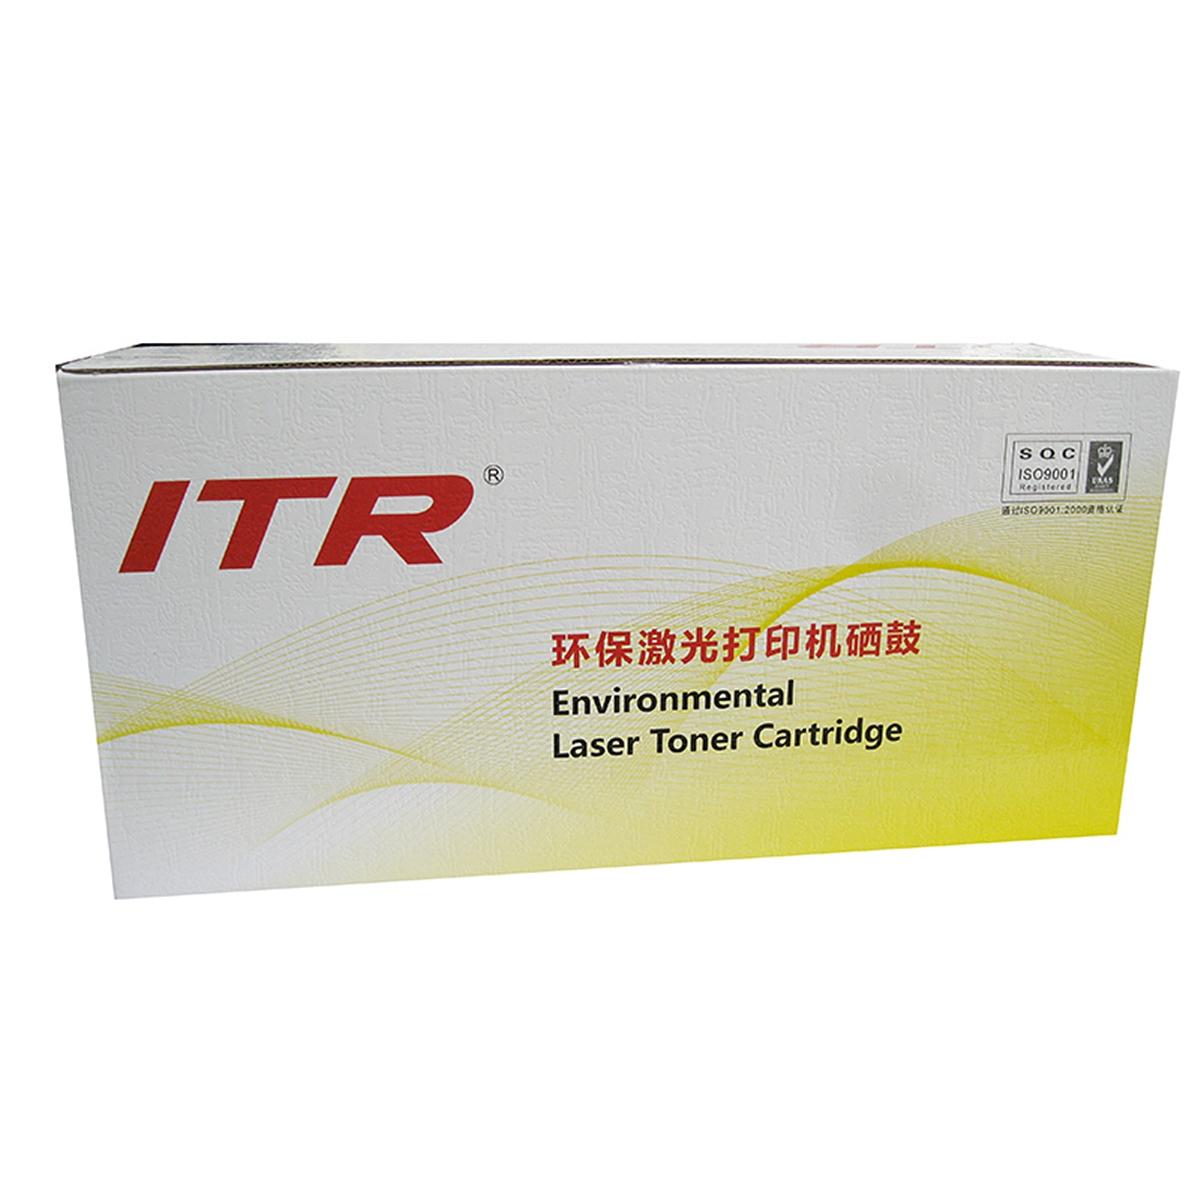 ITR-CN0493 兼容墨盒 (单位:盒) (适用于:EPSONSTYLUSPHOTOR210/R230/R310/RX510/RX630/R350)